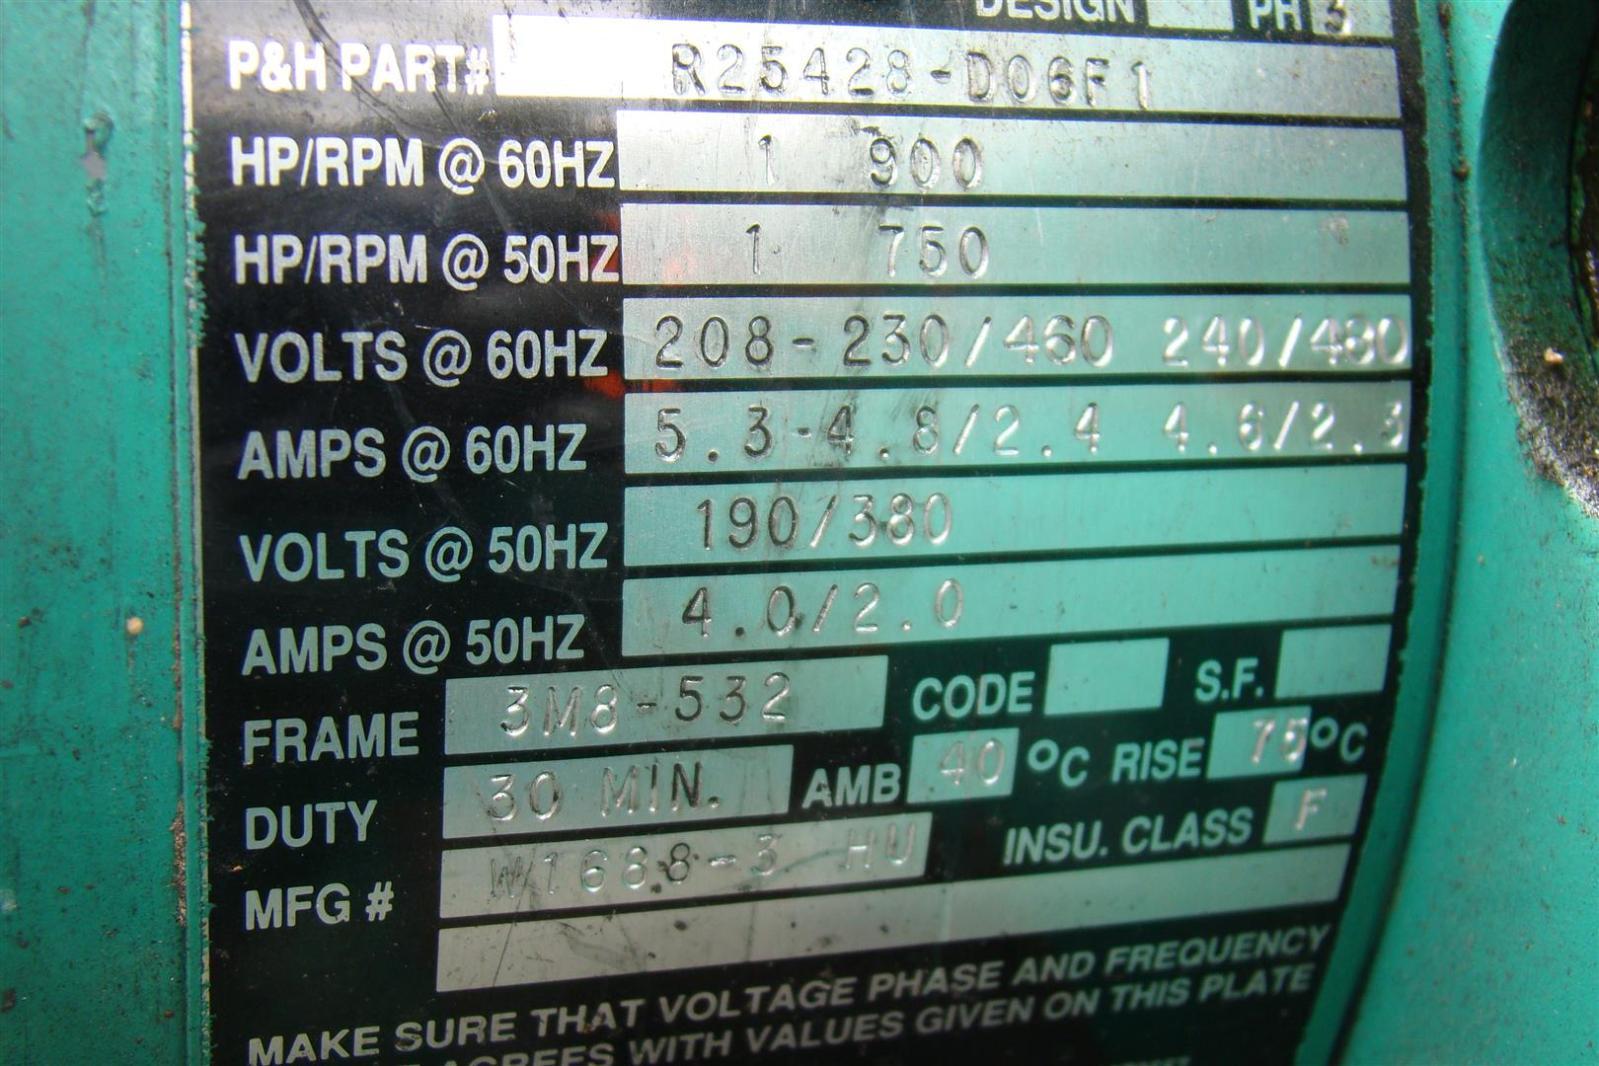 10706 morris ph bridge crane 10000lbs 3ph 230 460v 20 fpm tp12293 n24jj11d 8?resize=665%2C443 dsr crane hi 6 wiring diagram conventional fire alarm wiring crane hi 6 wiring diagram at gsmx.co